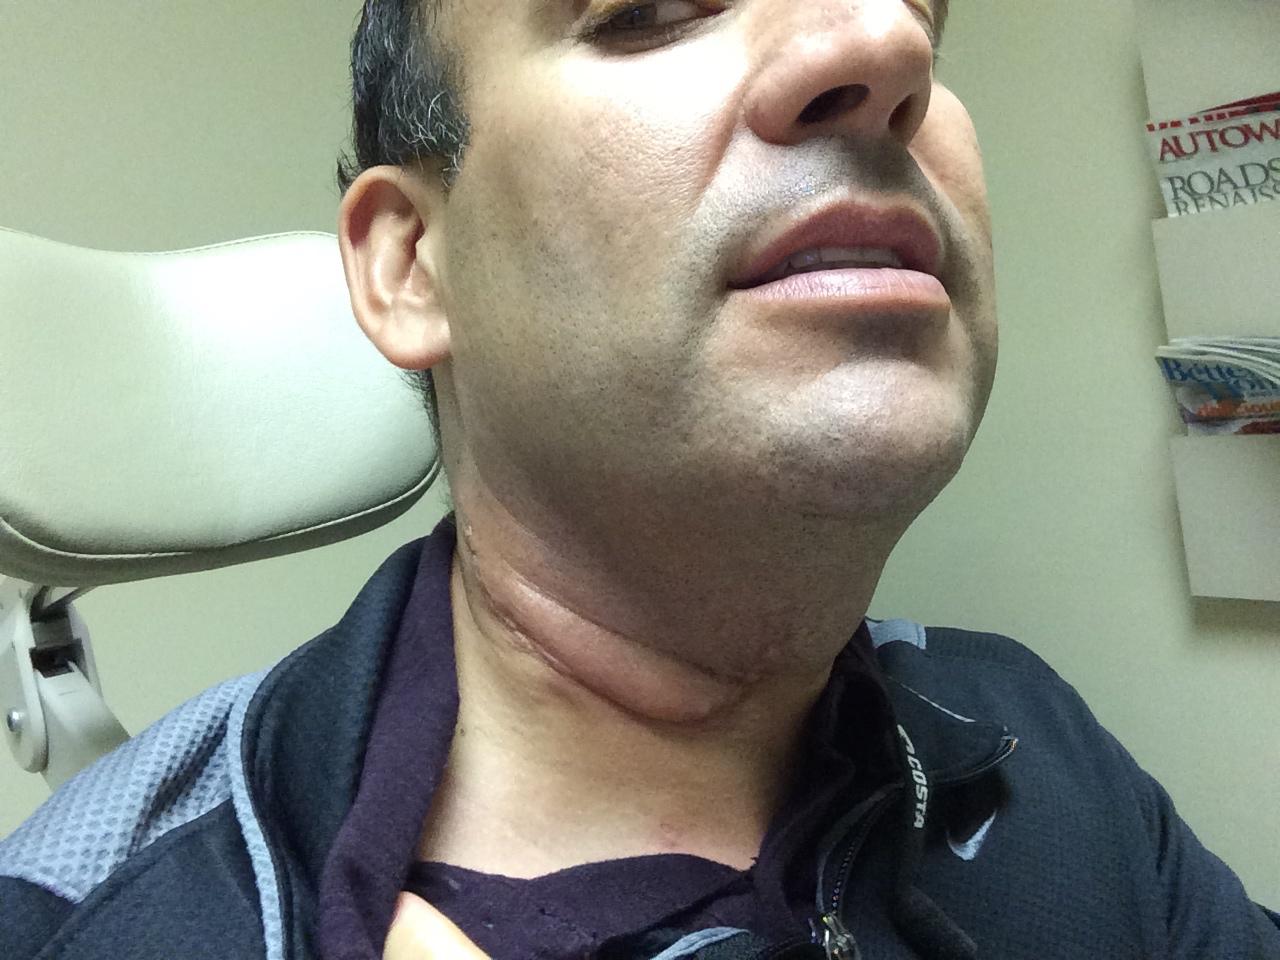 hpv neck lymph nodes